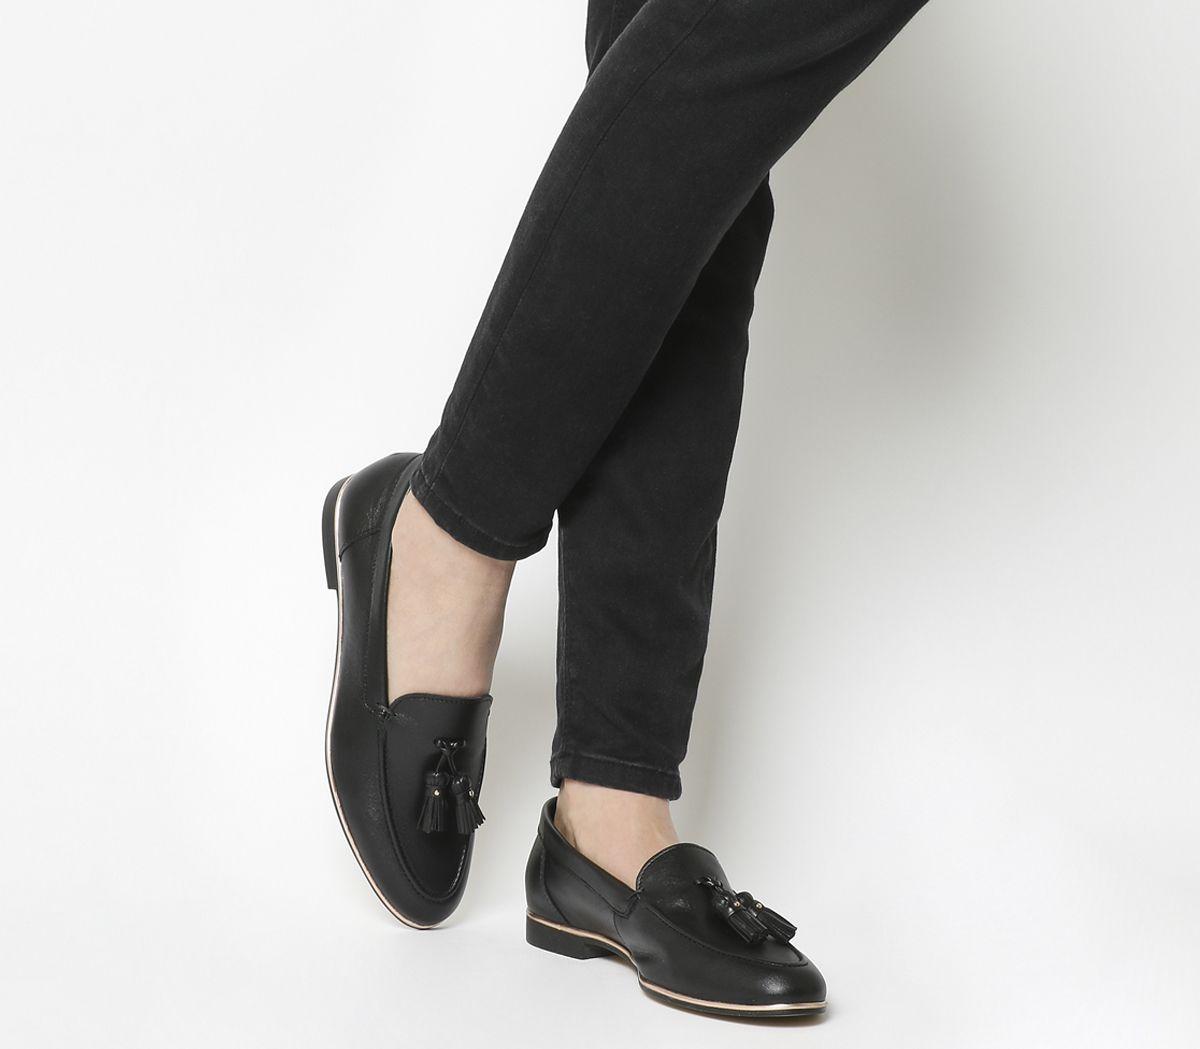 84af096b105 Office Retro Tassel Loafers Black Leather Rose Gold Rand - Flats